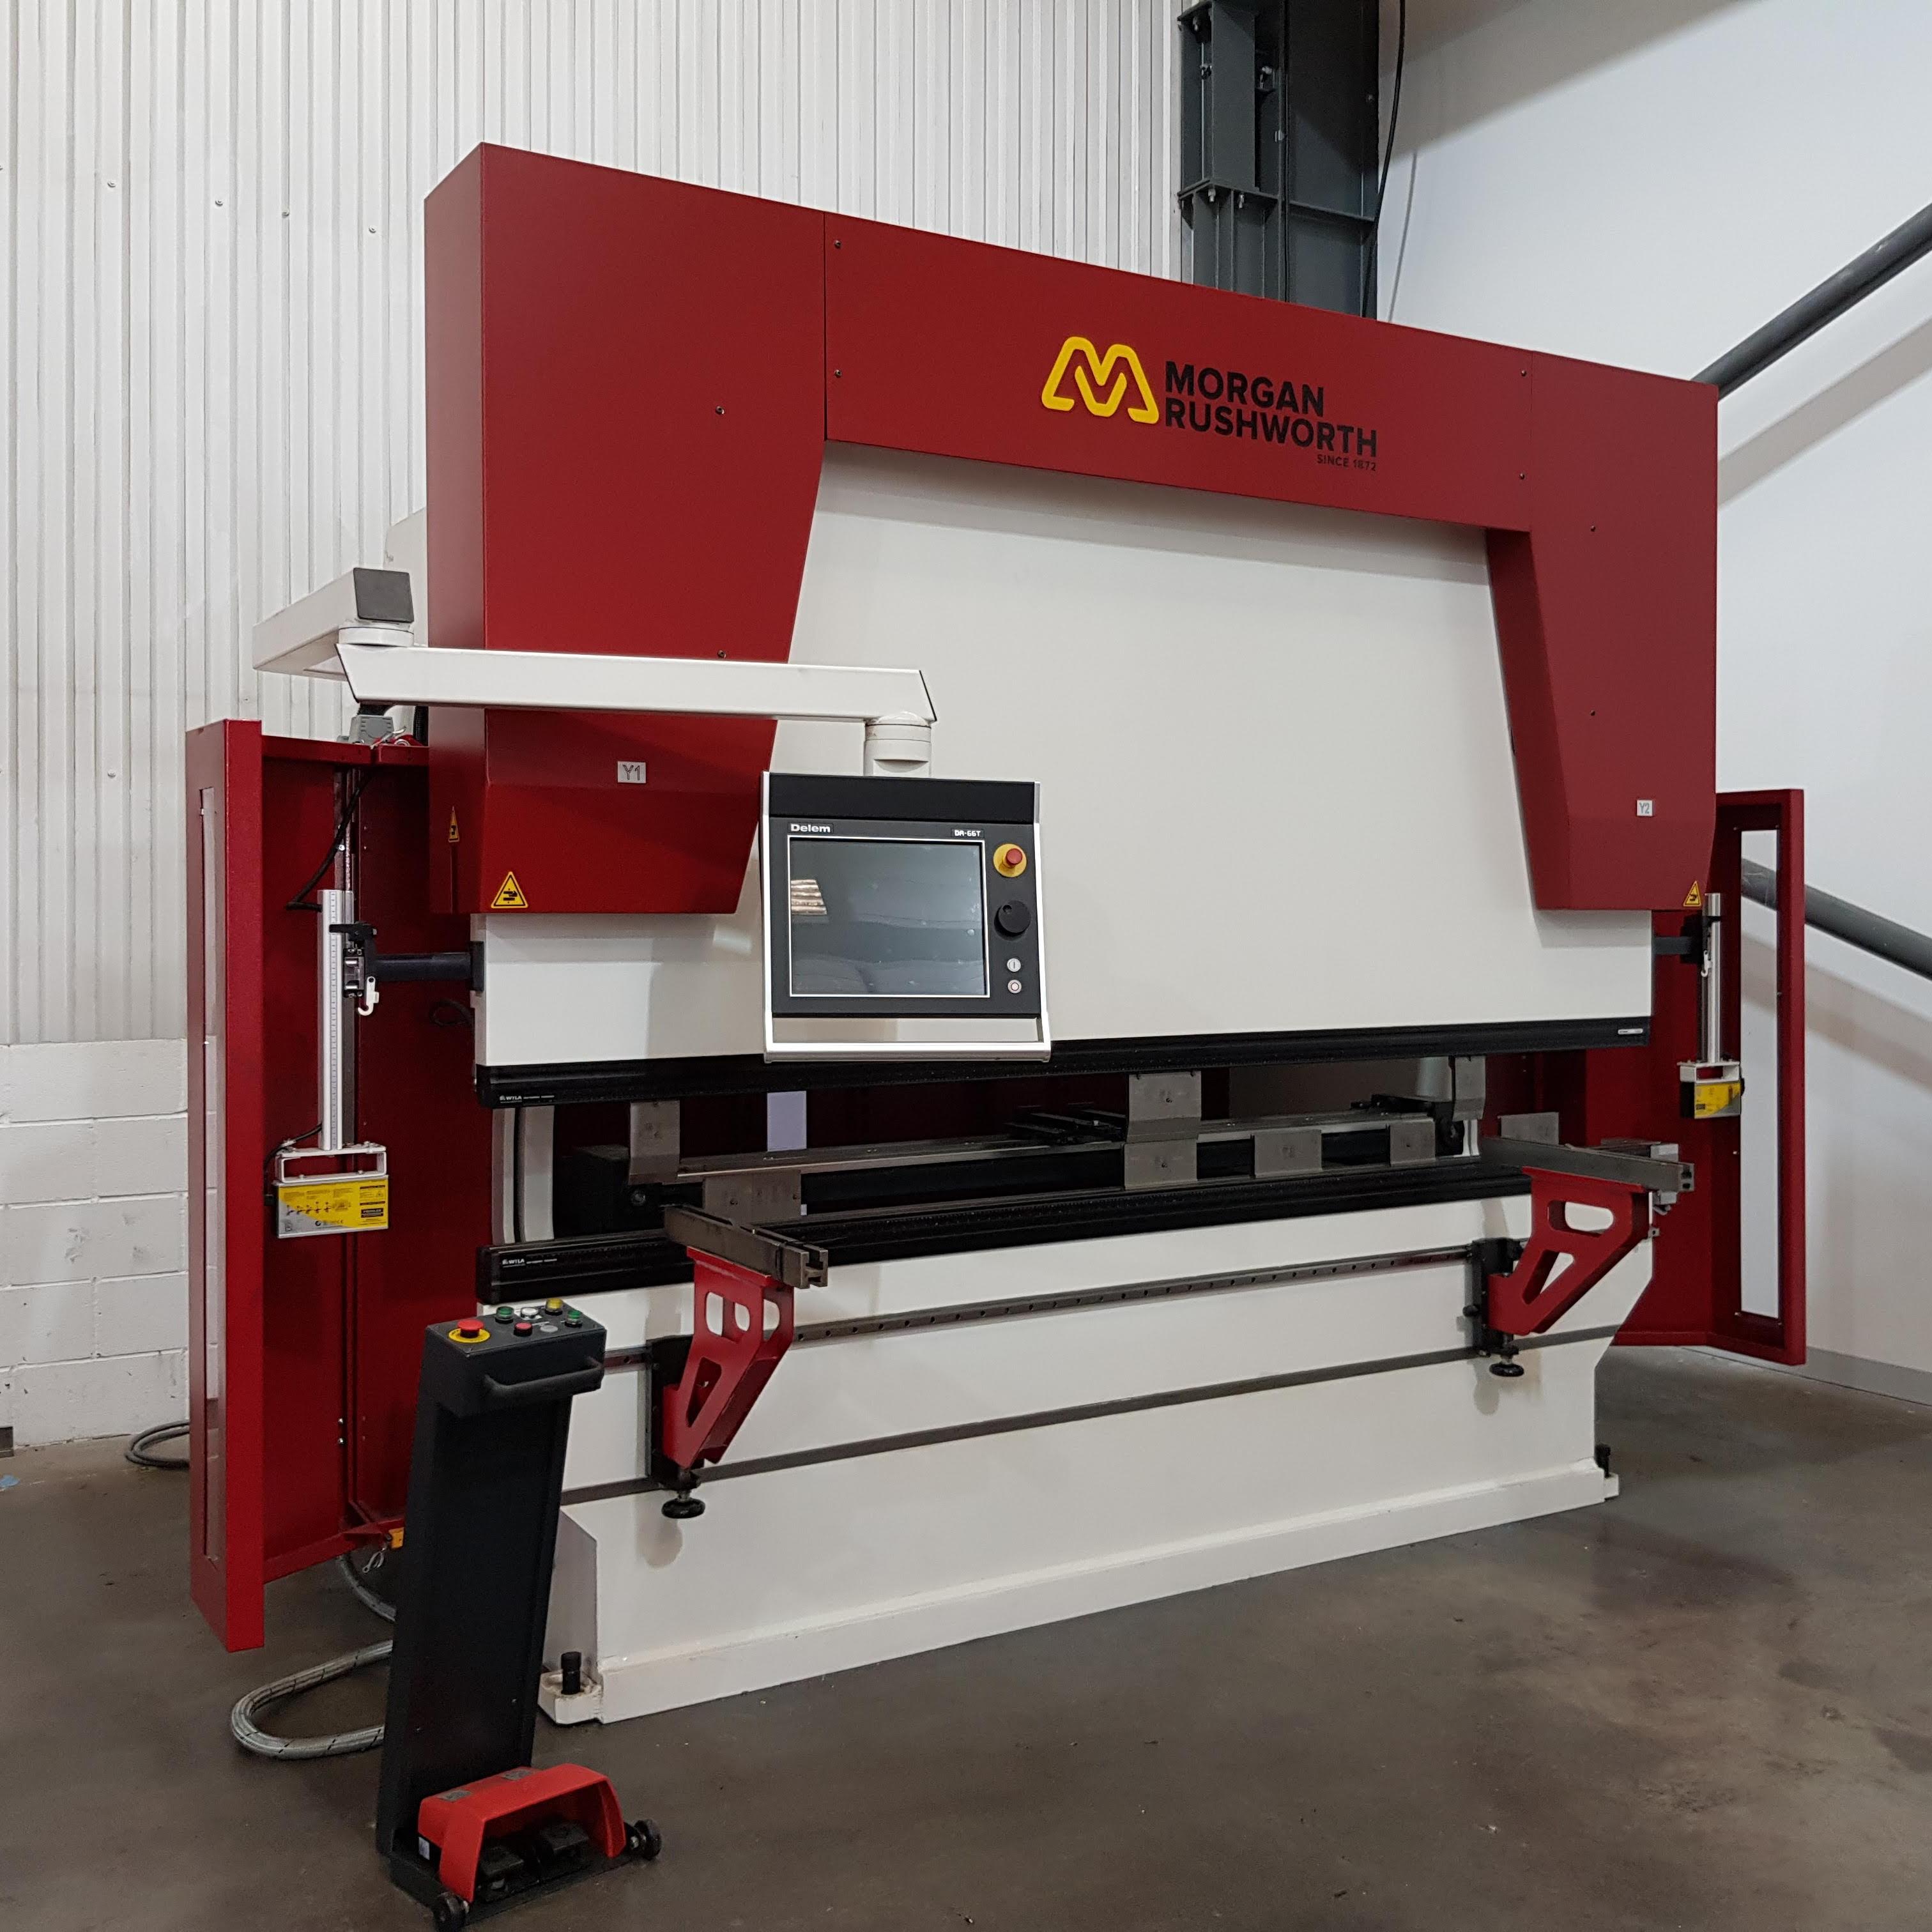 EX DEMO - Morgan Rushworth PBXS CNC 3100/200 Hydraulic Press Brake